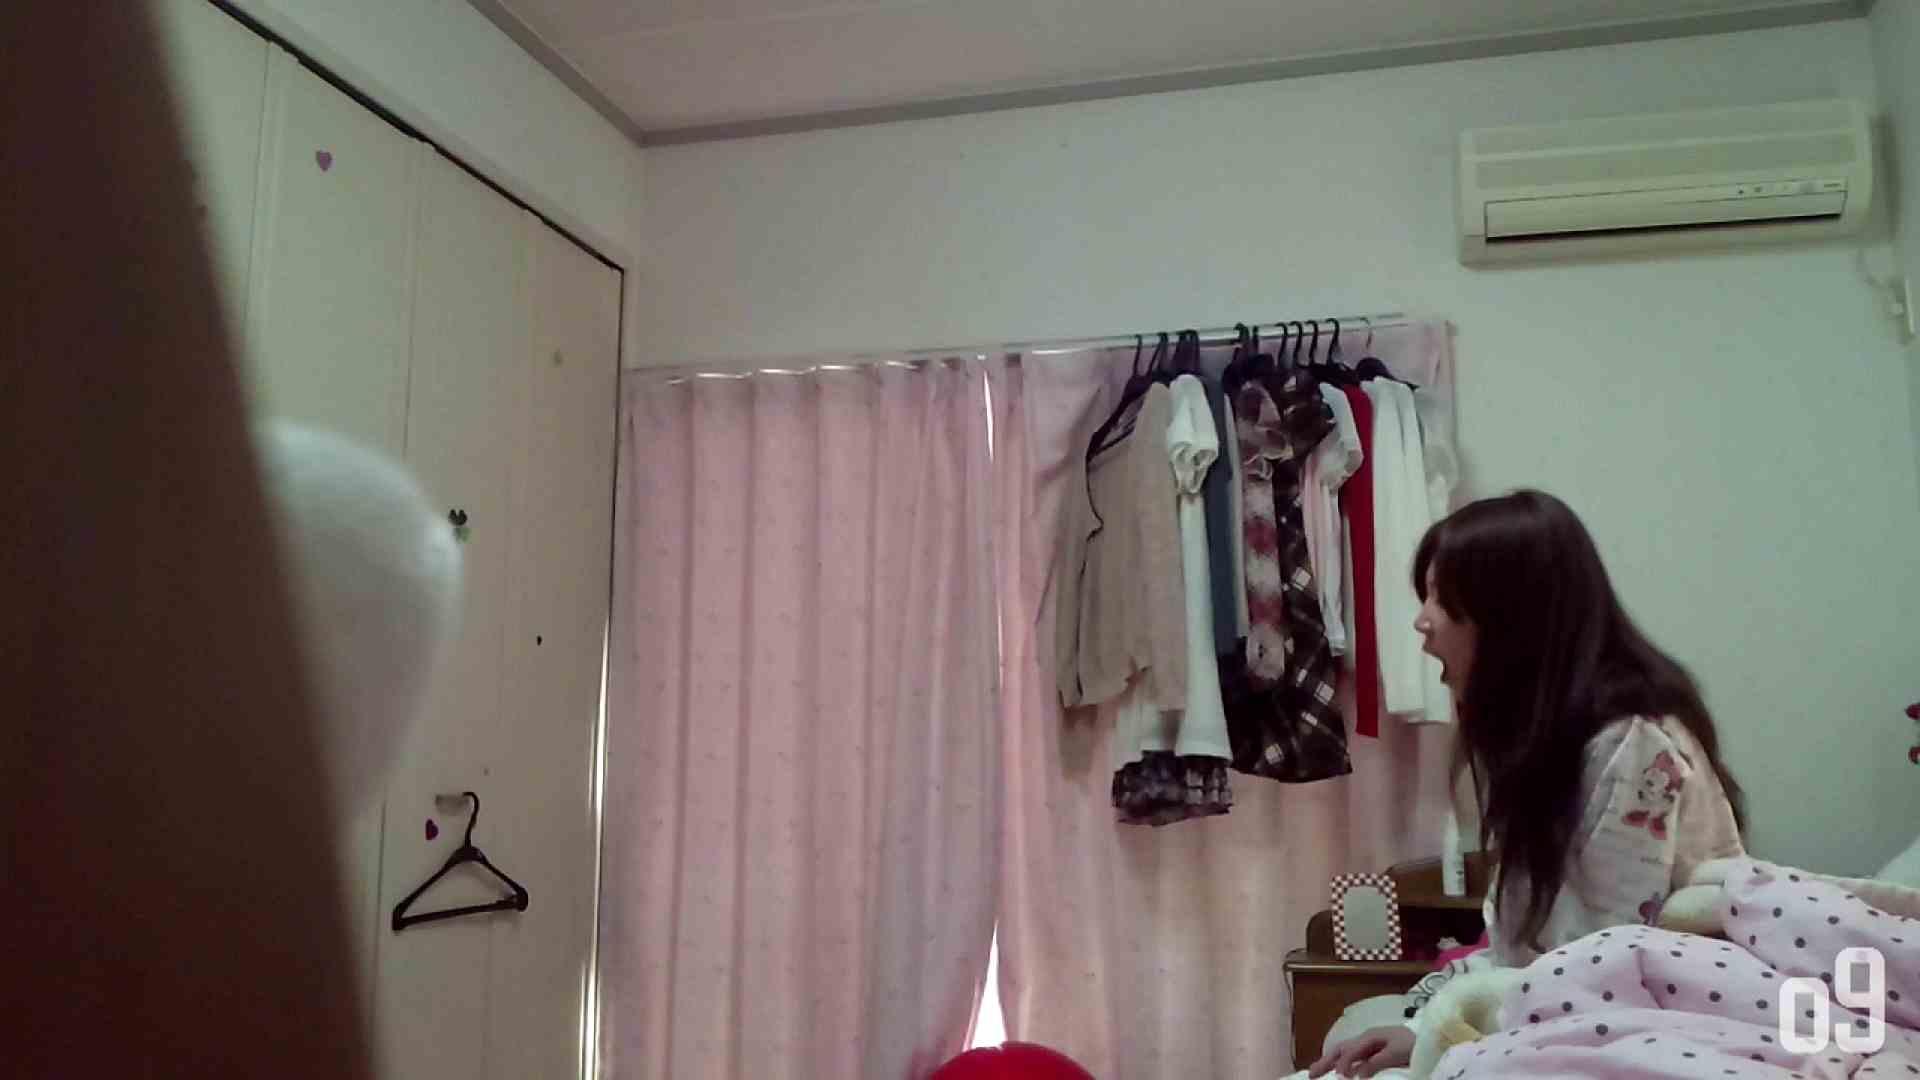 vol.2 瑞希ちゃんの自宅公開!寝起きの着替え・・・ラリルそー 着替え  77pic 9